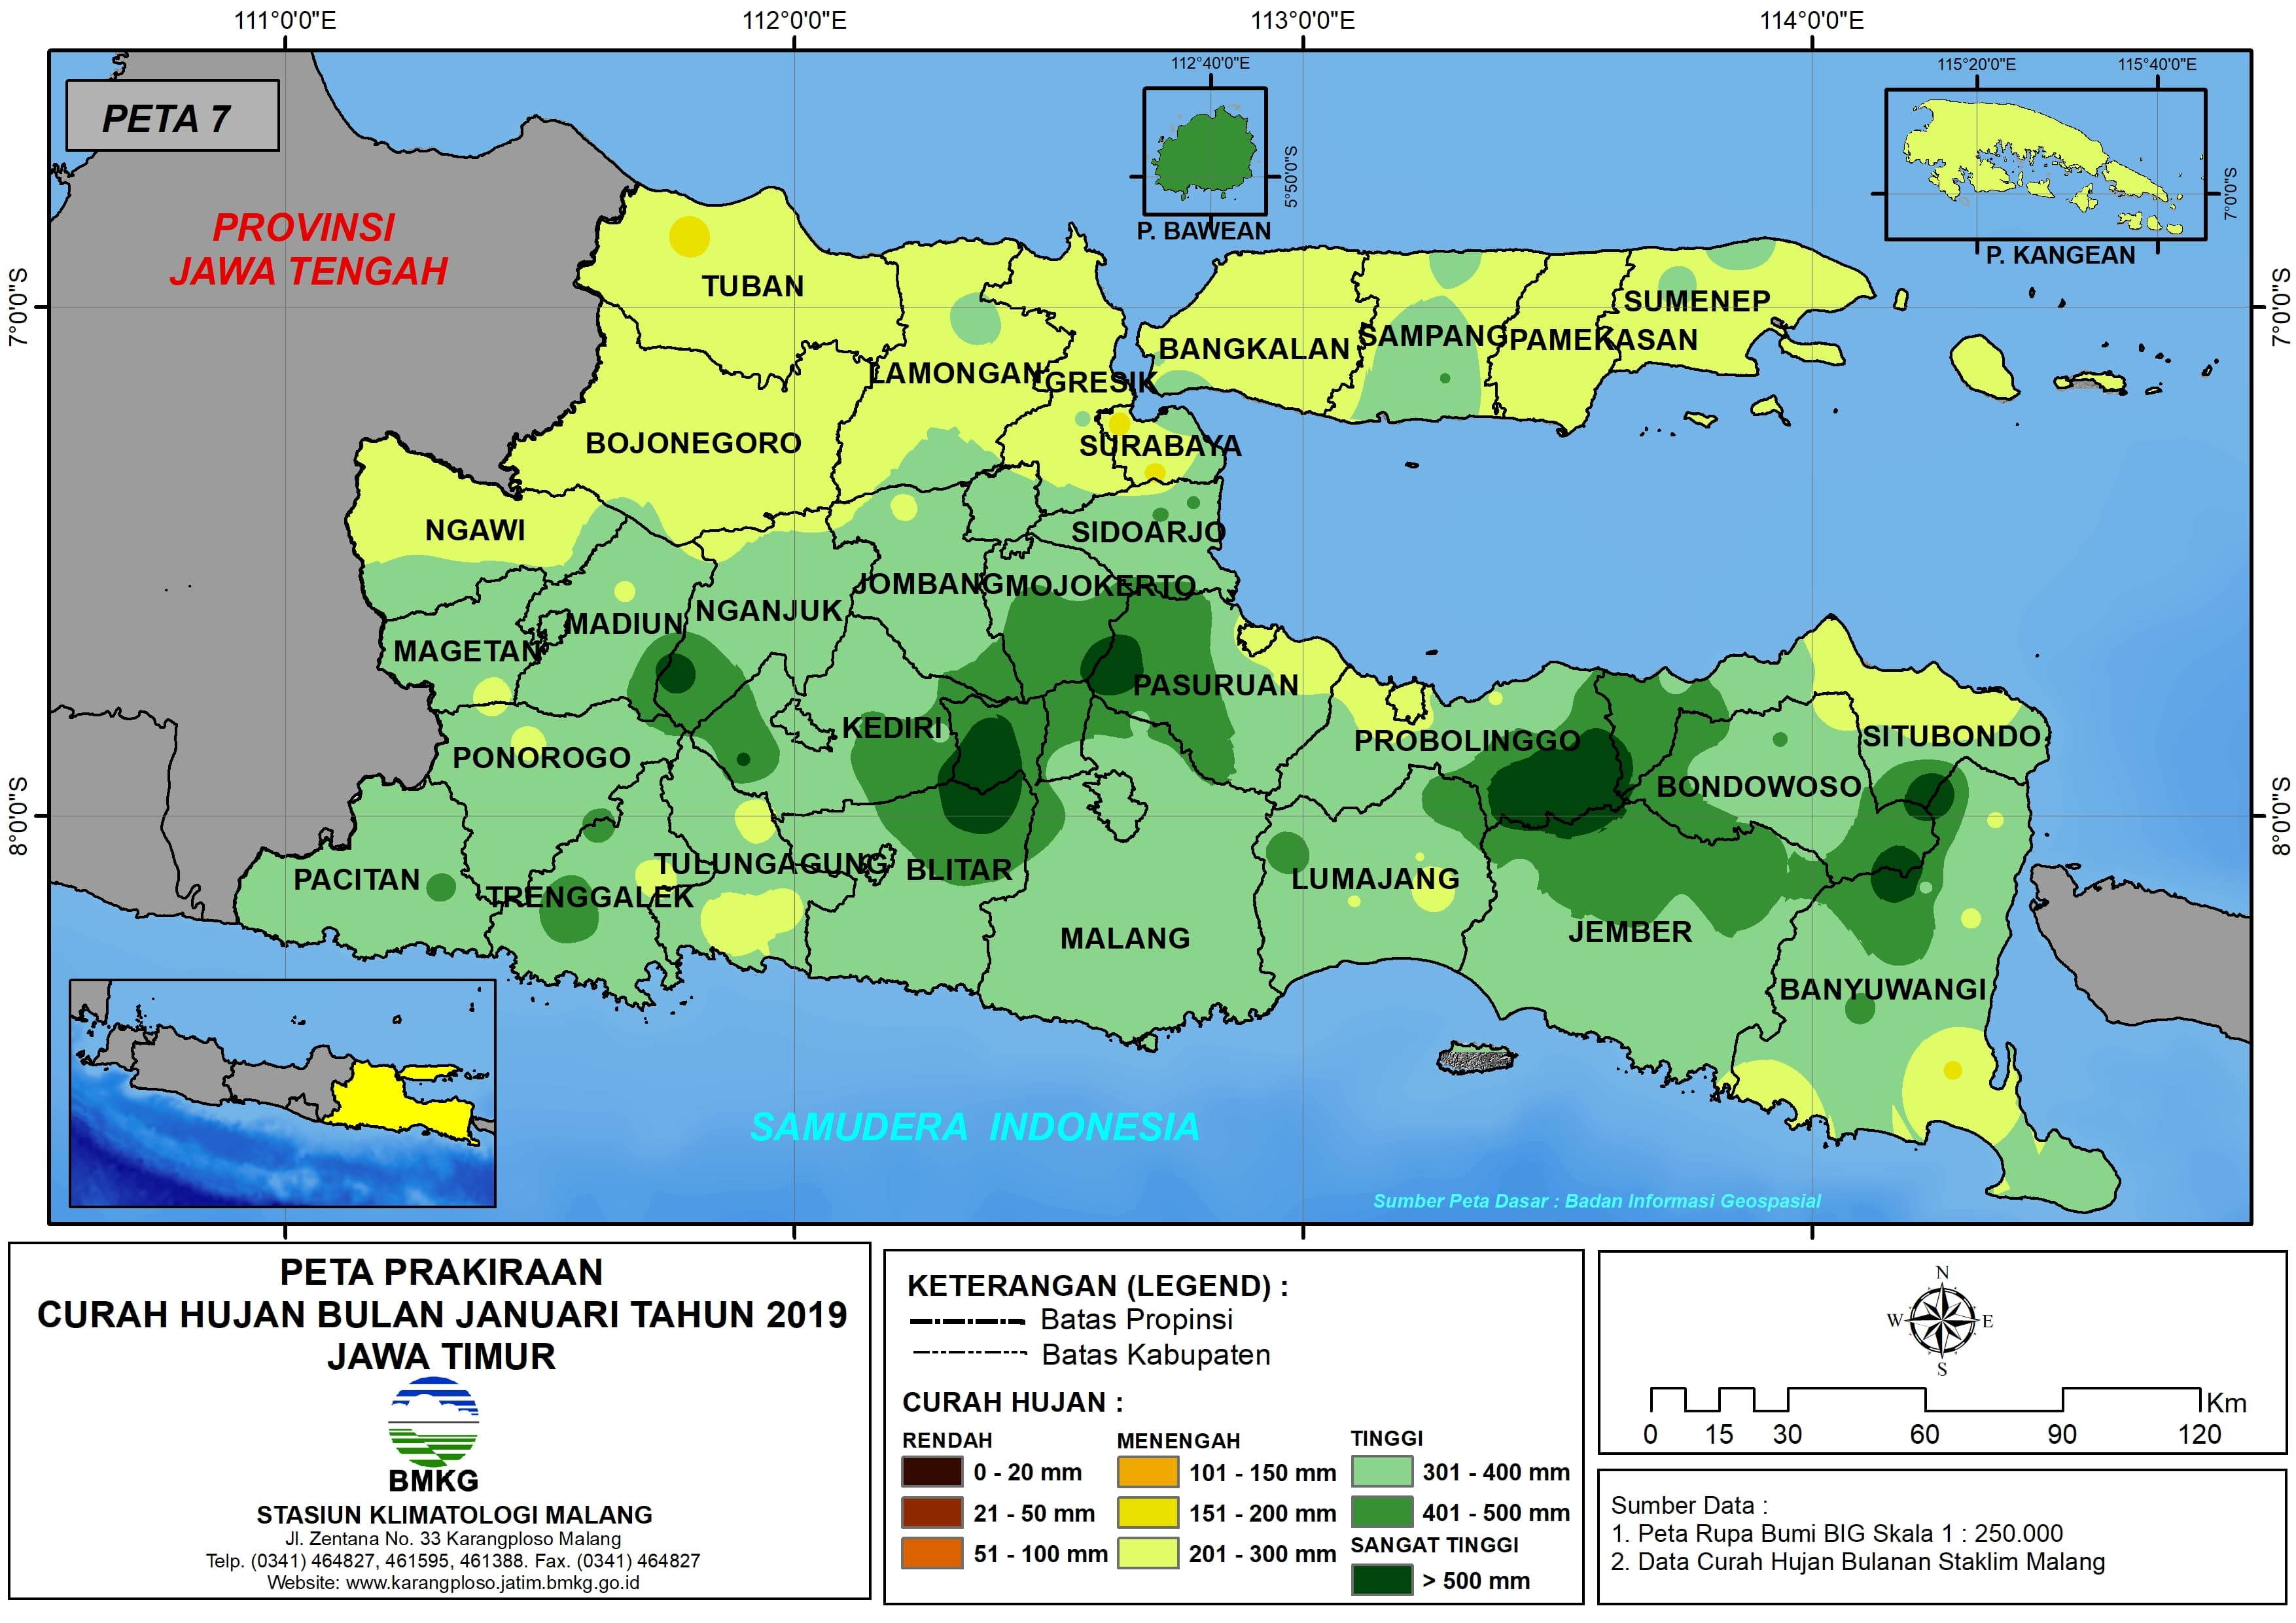 Prakiraan Curah Hujan Bulan Januari Tahun 2019 di Provinsi Jawa Timur Update dari Analisis Bulan Oktober 2018